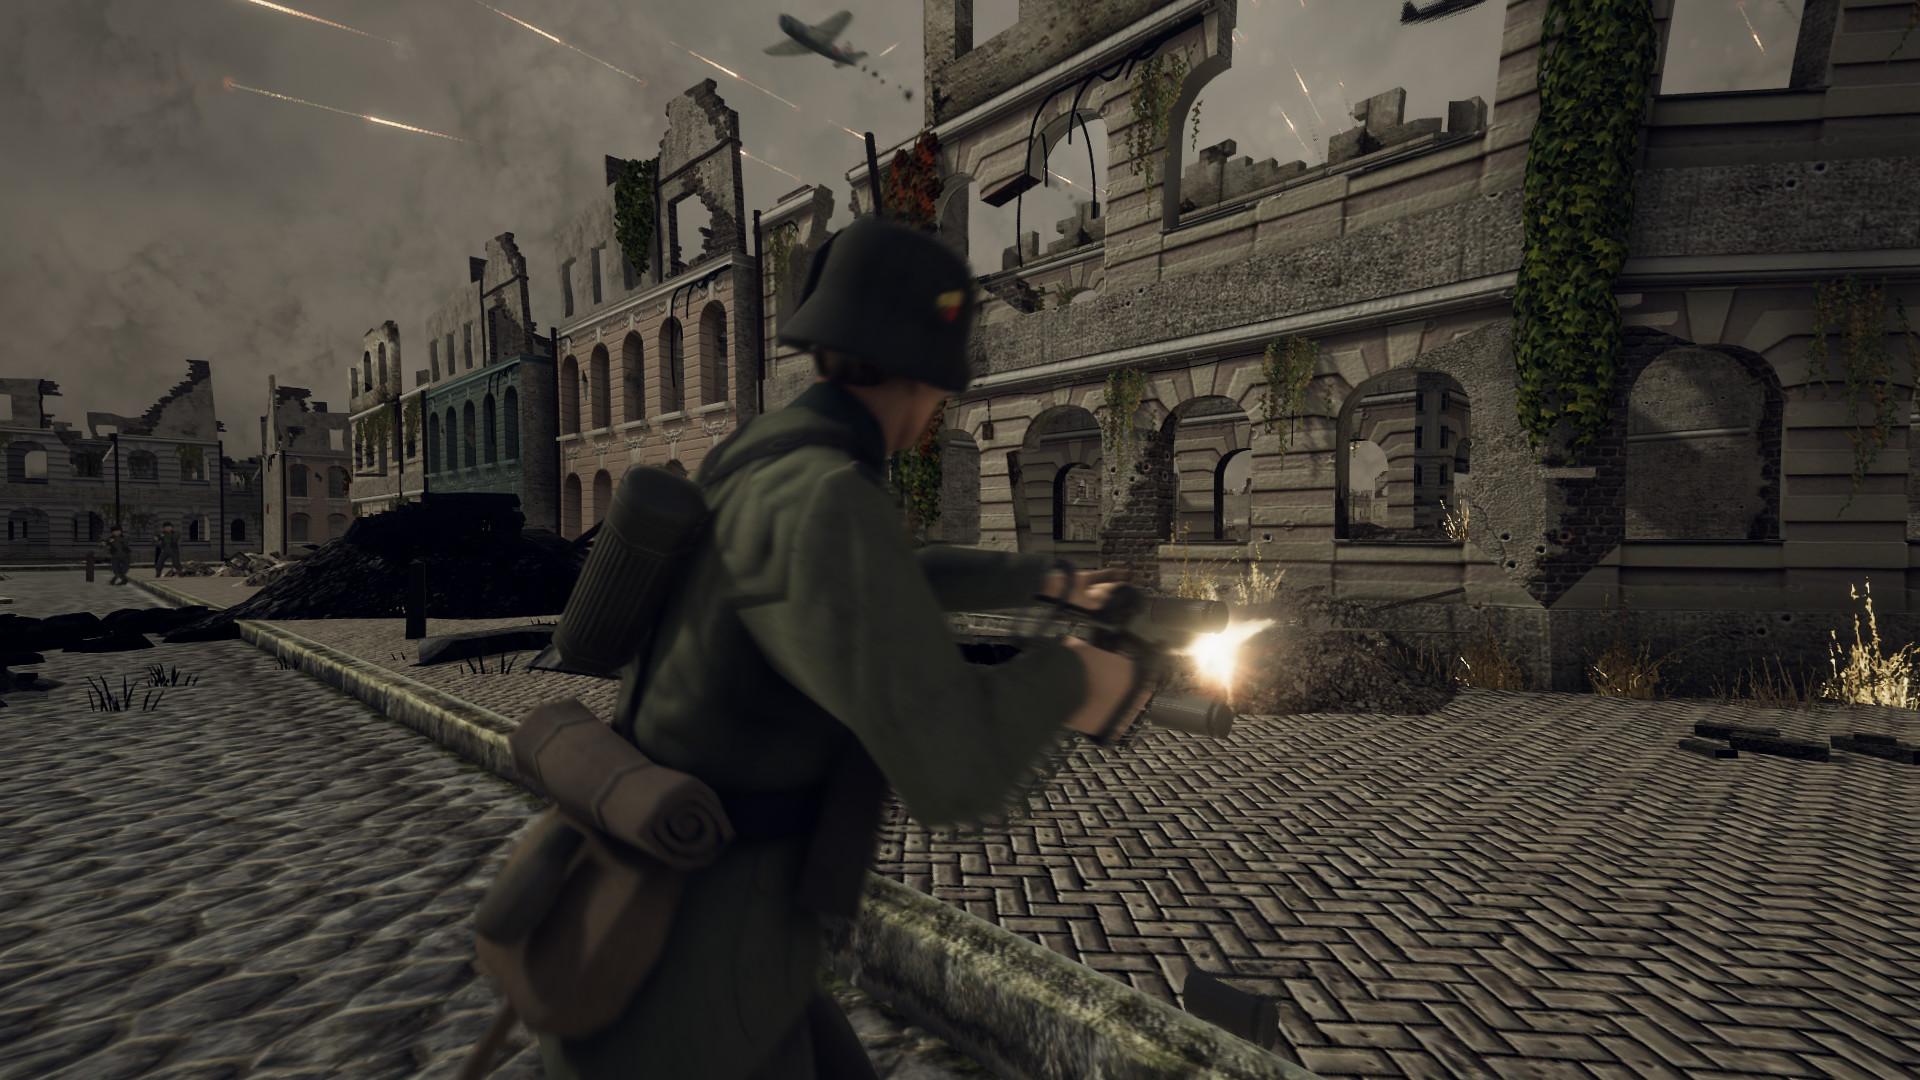 3D Hentai Game Video hentai - world war ii